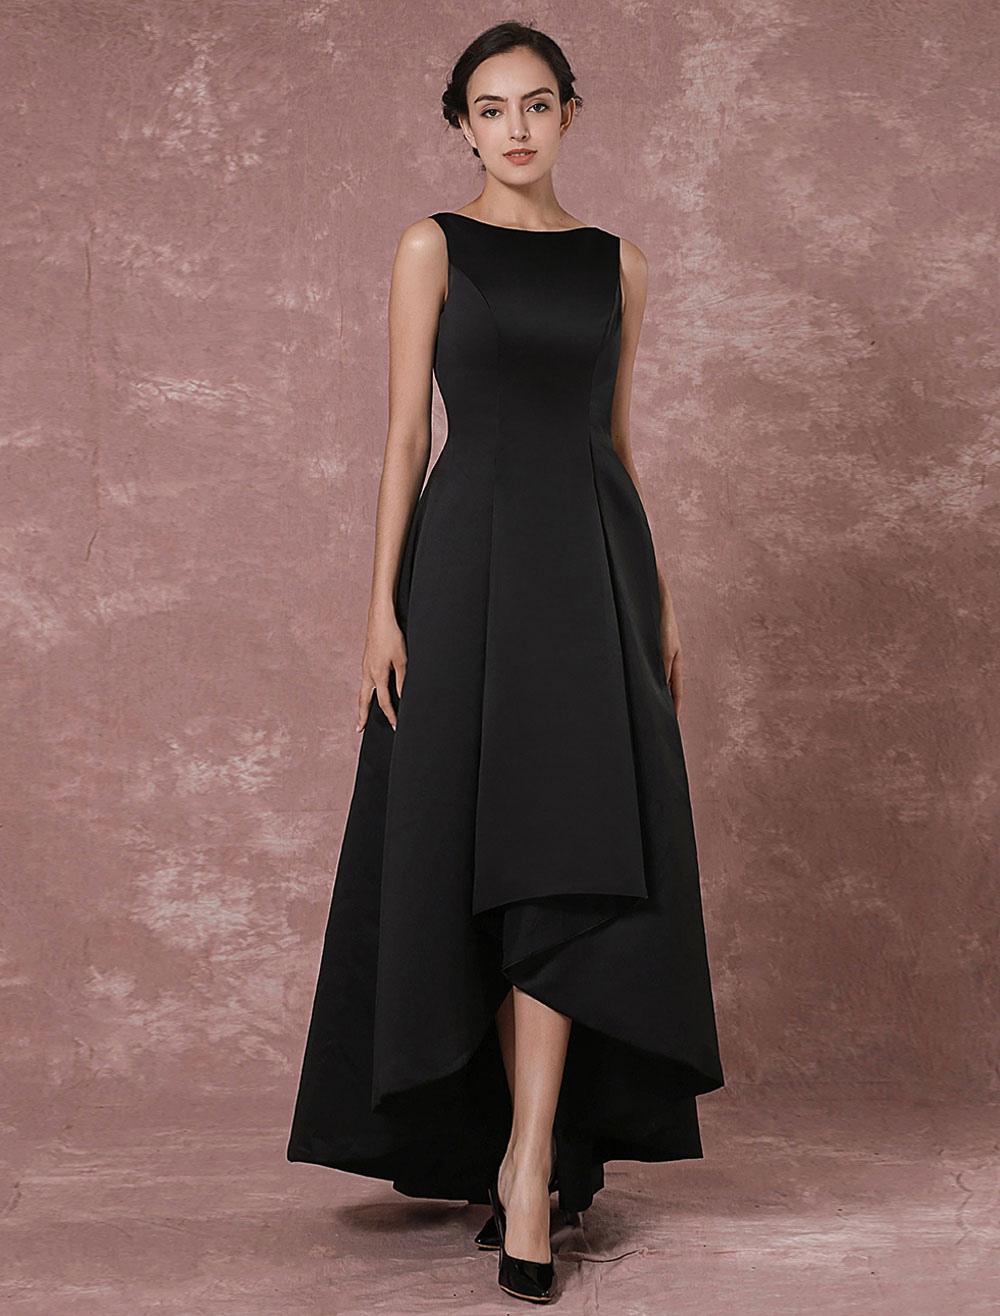 Black Prom Dresses 2018 Long Backless Evening Dress Taffeta High Low Pleated Party Dress (Wedding Evening Dresses) photo